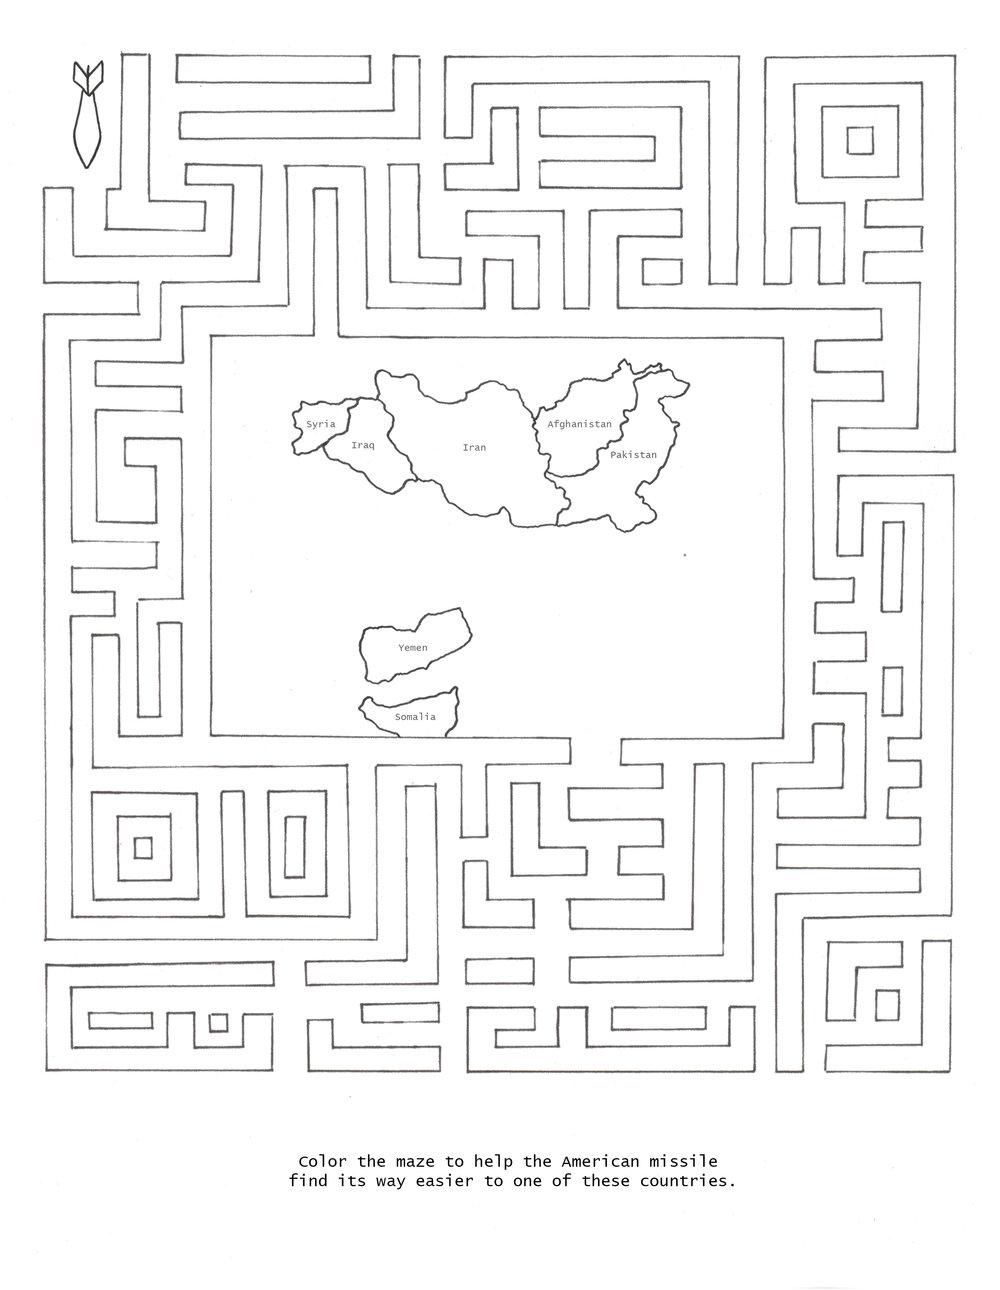 Drawing by Mart Paadik and Bita Razavi